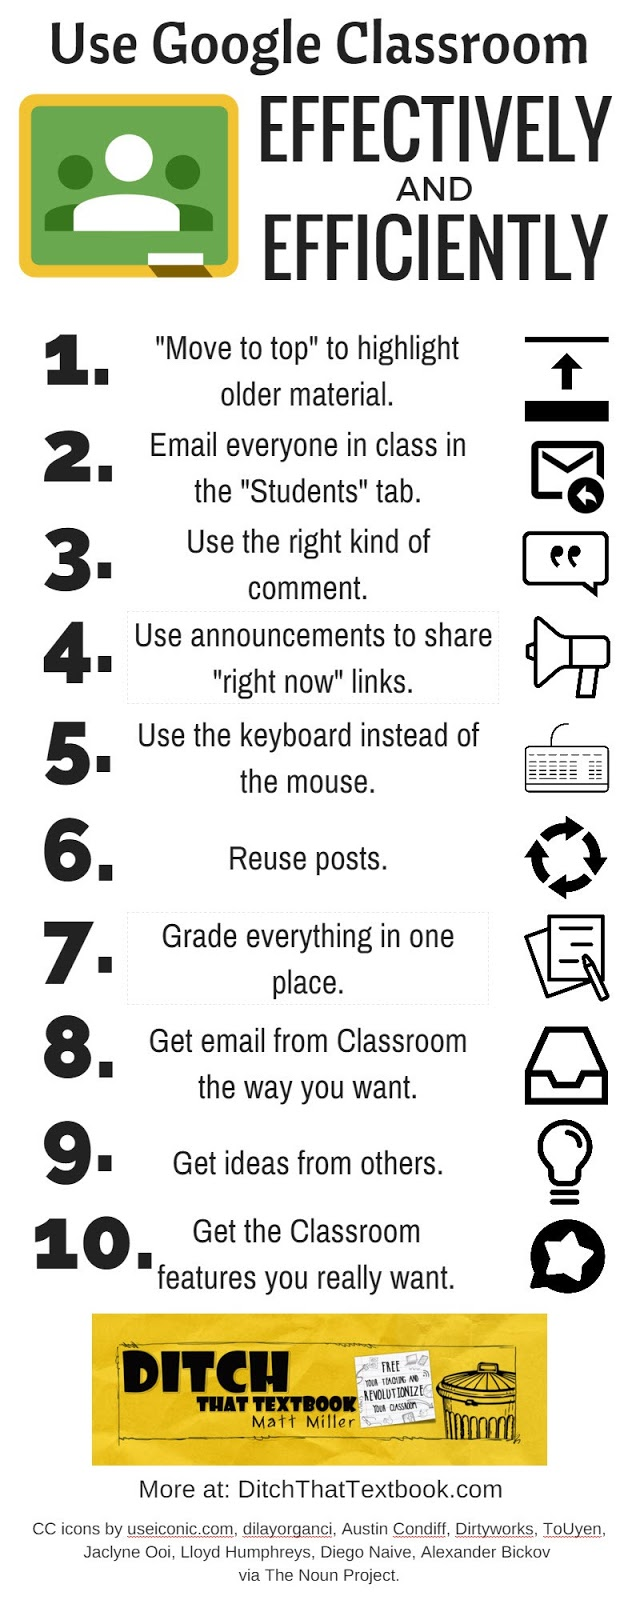 Innovative Classroom Strategies For Effective On Educational Transaction ~ The edtech sandbox january